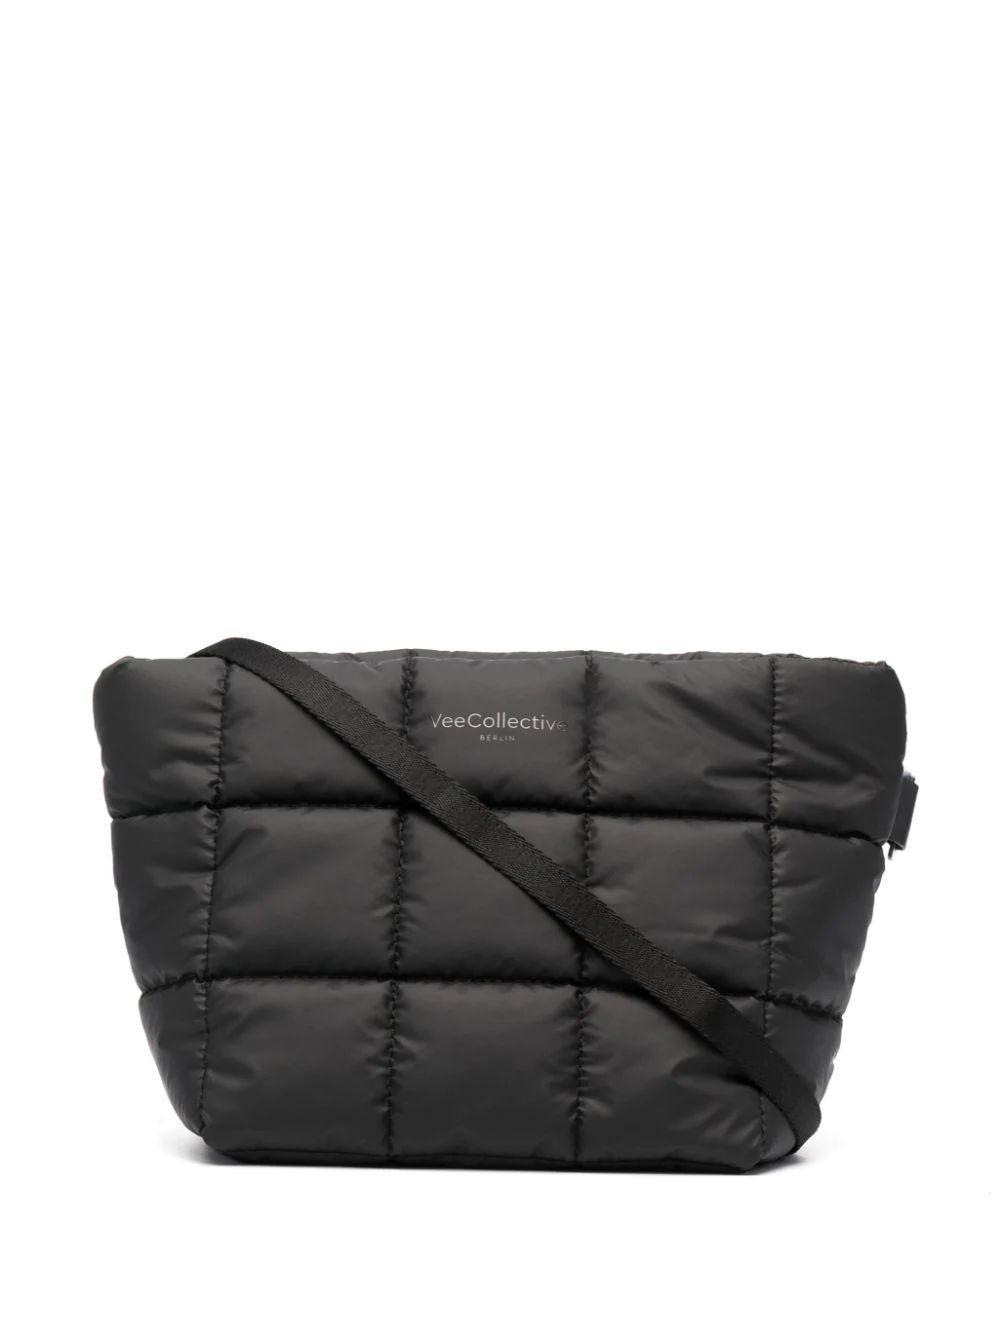 Porter Bag Item # 117-200-339